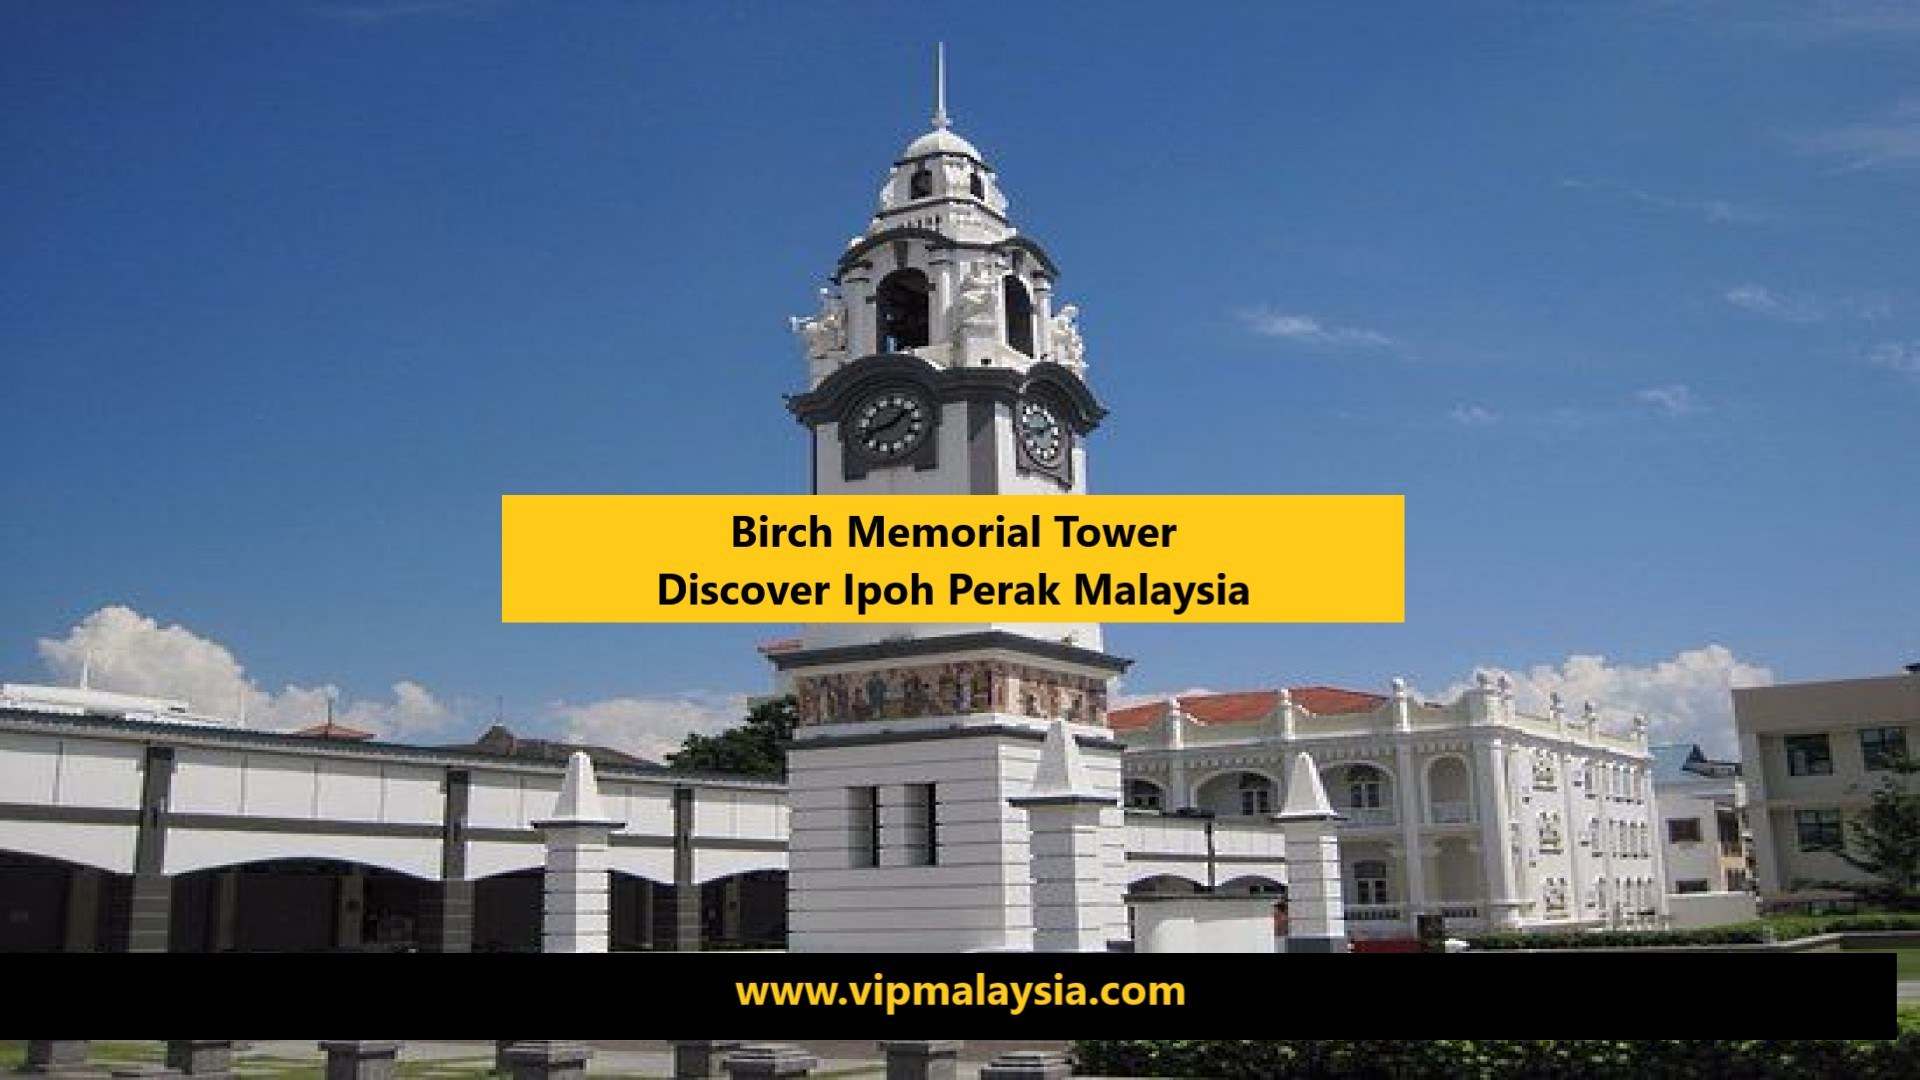 Birch Memorial Clock Tower Discover Ipoh Perak Malaysia